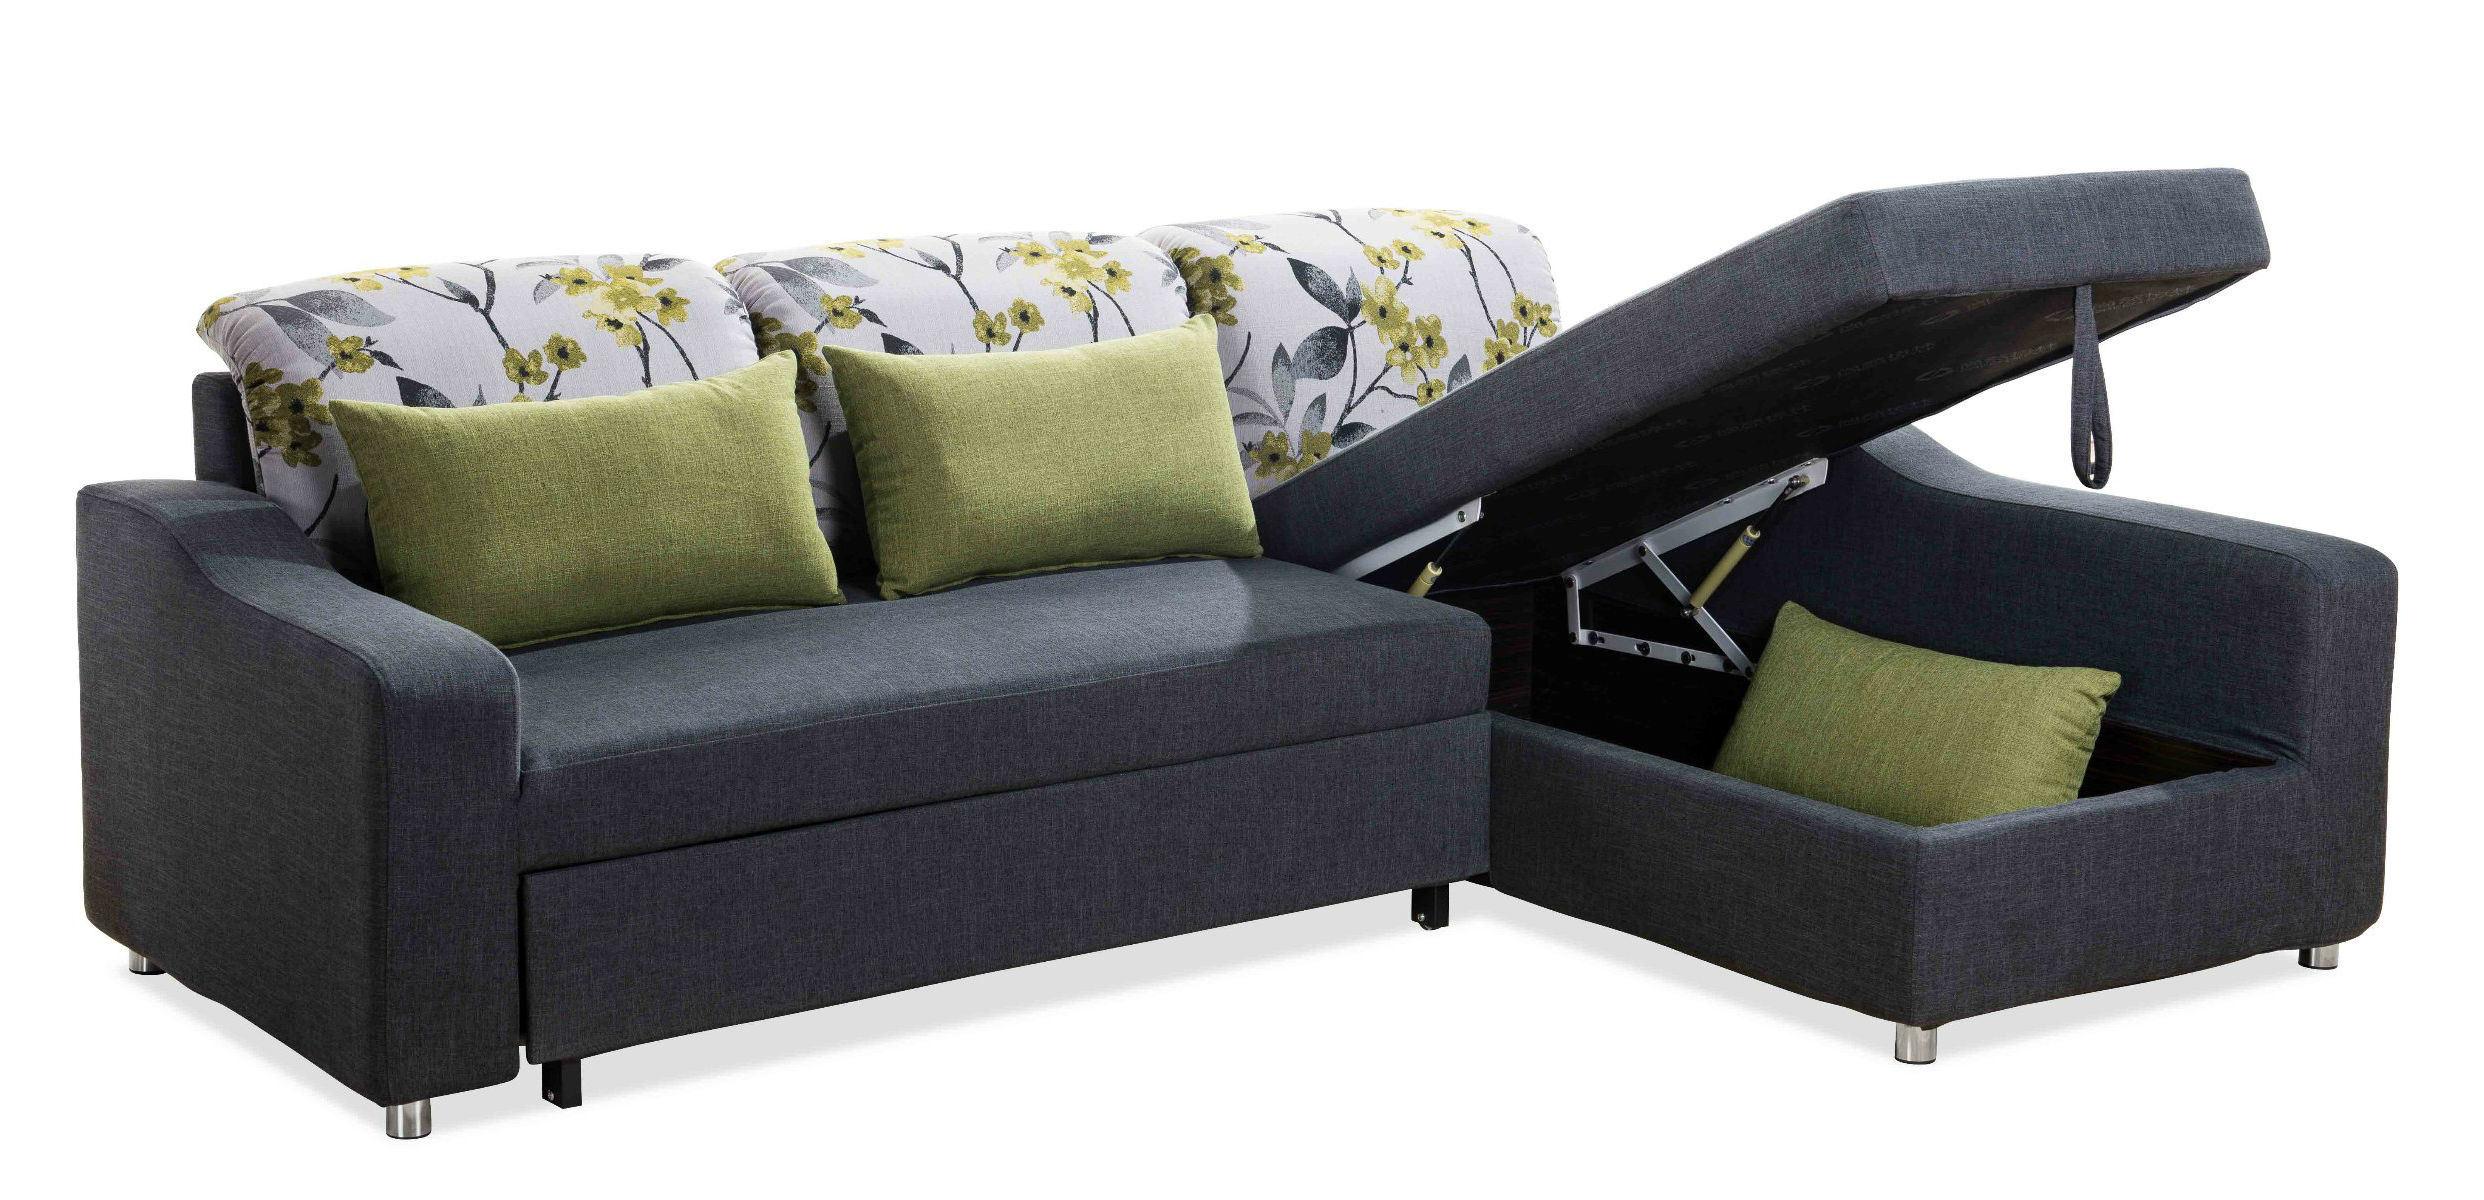 2017 New Design Modern Fabric Living Room Furniture (sofa cum bed)